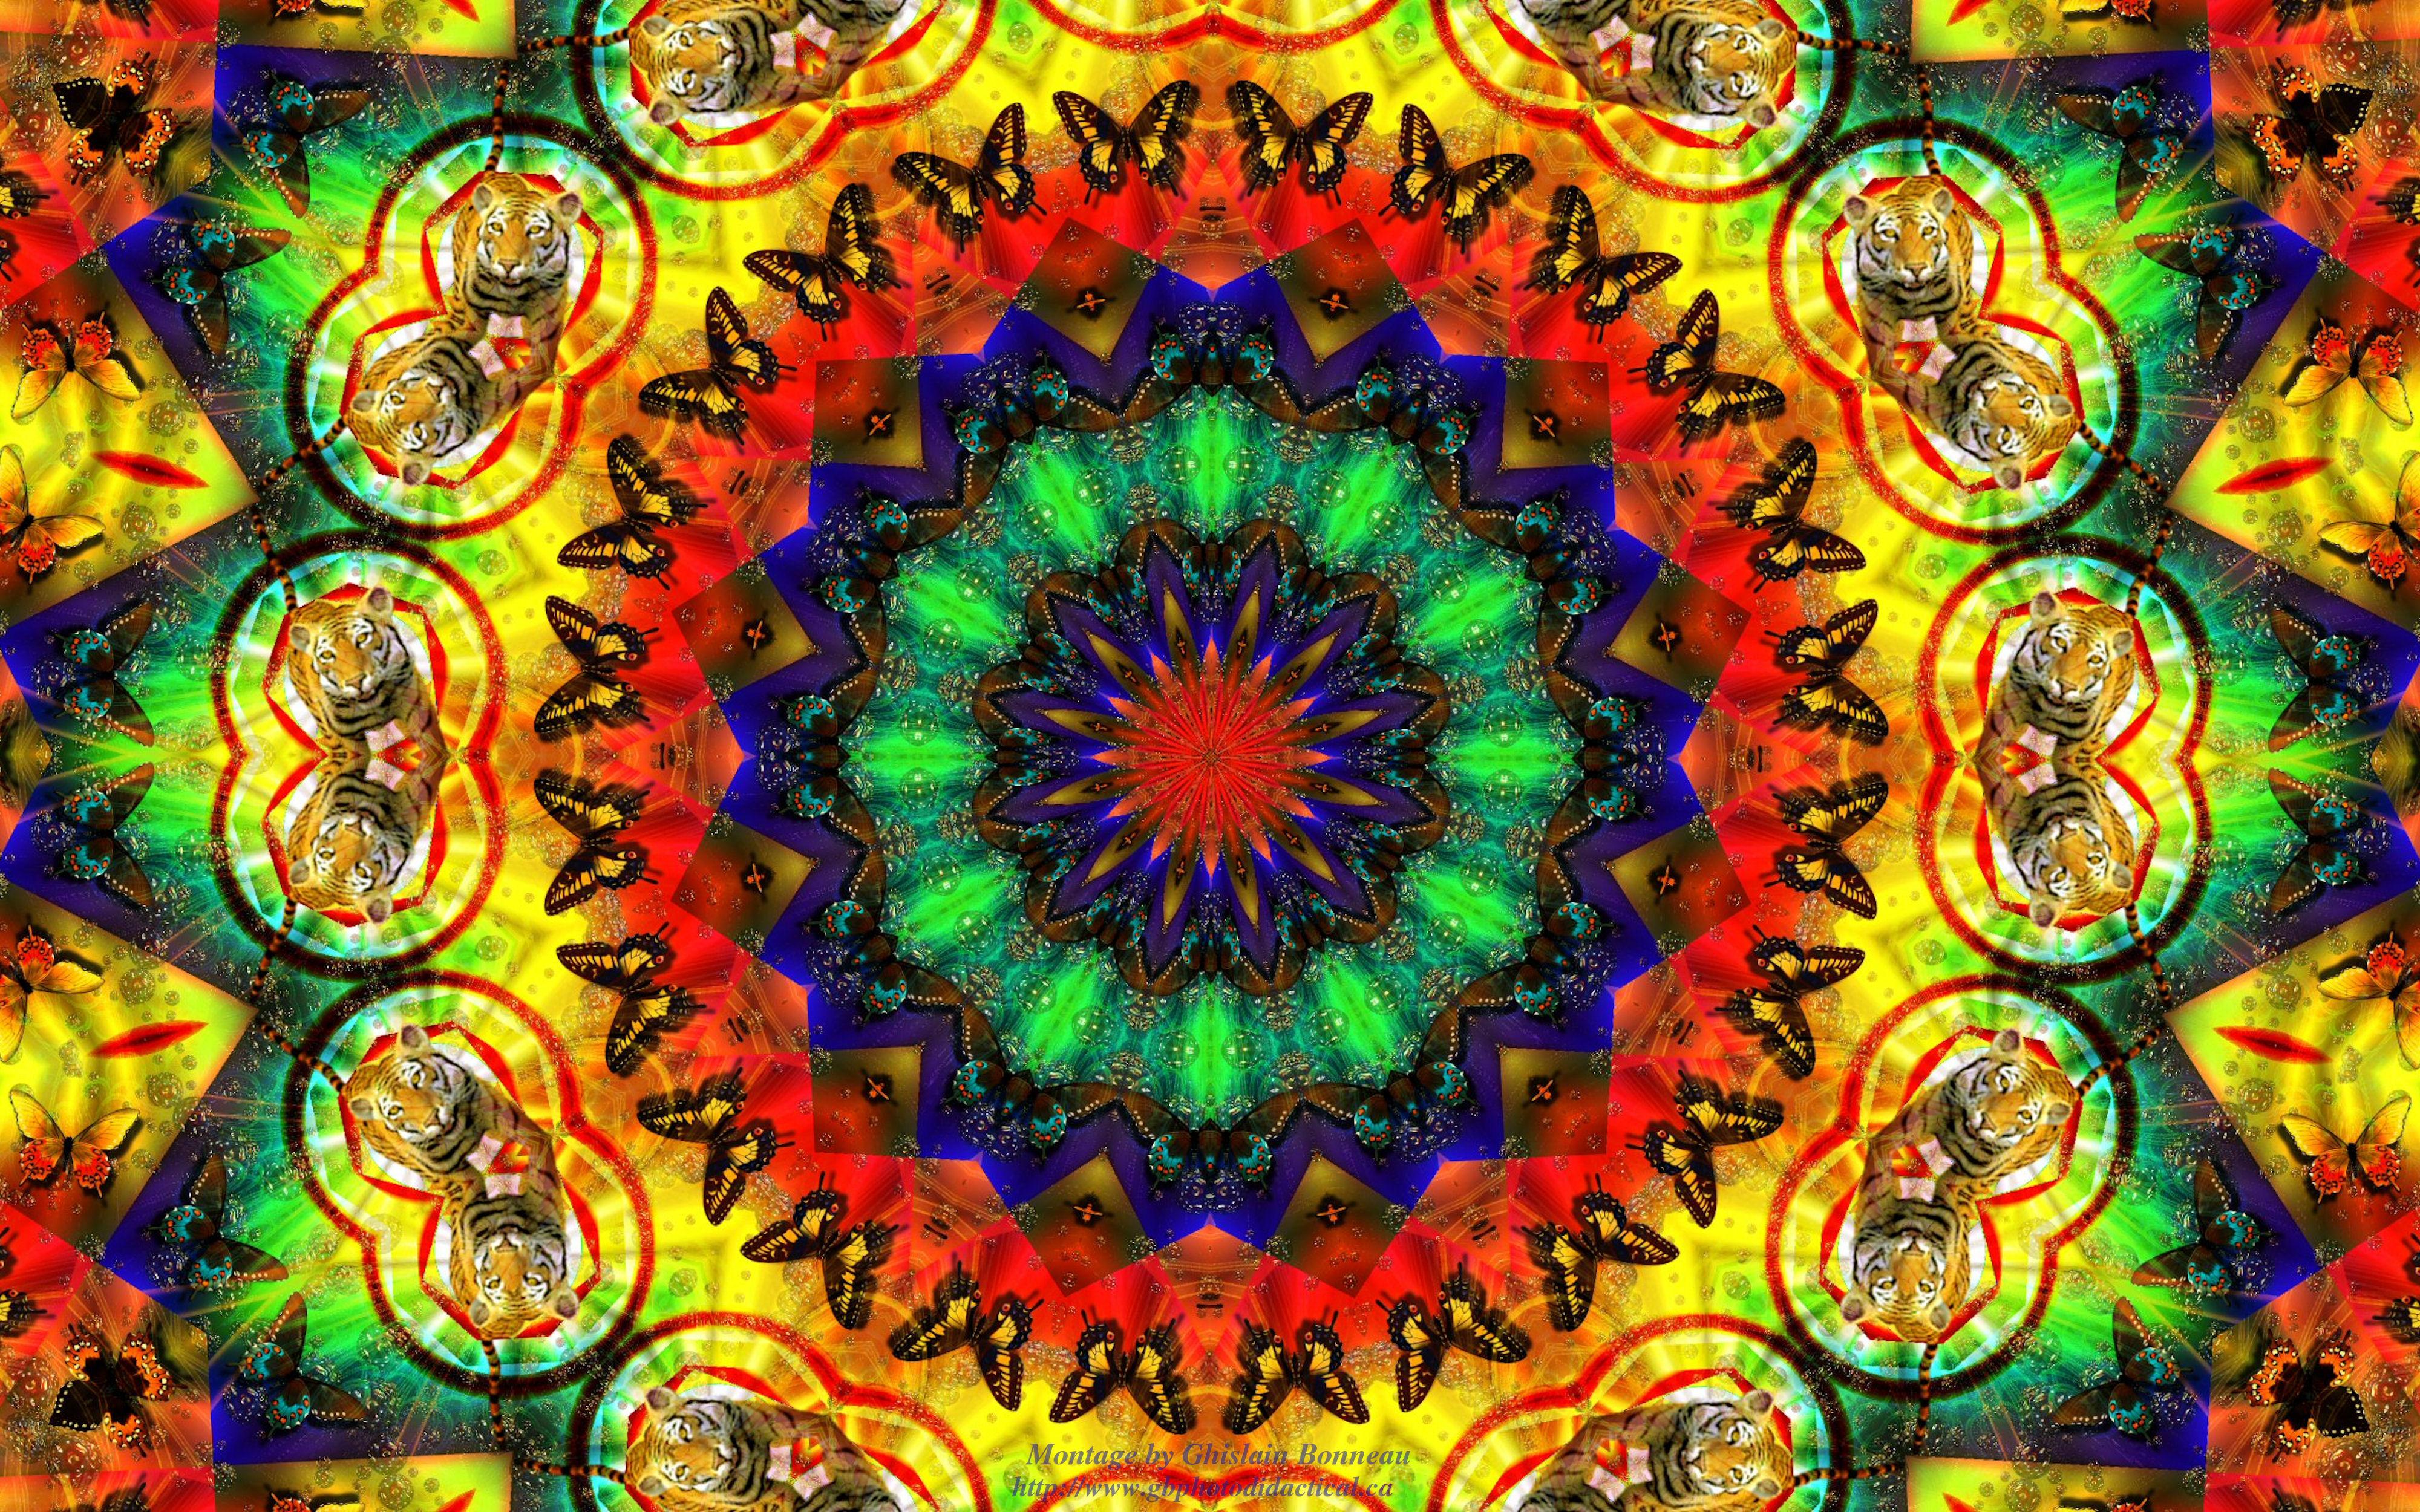 Hippie acid wallpaper HD wallpaper background 4000x2500